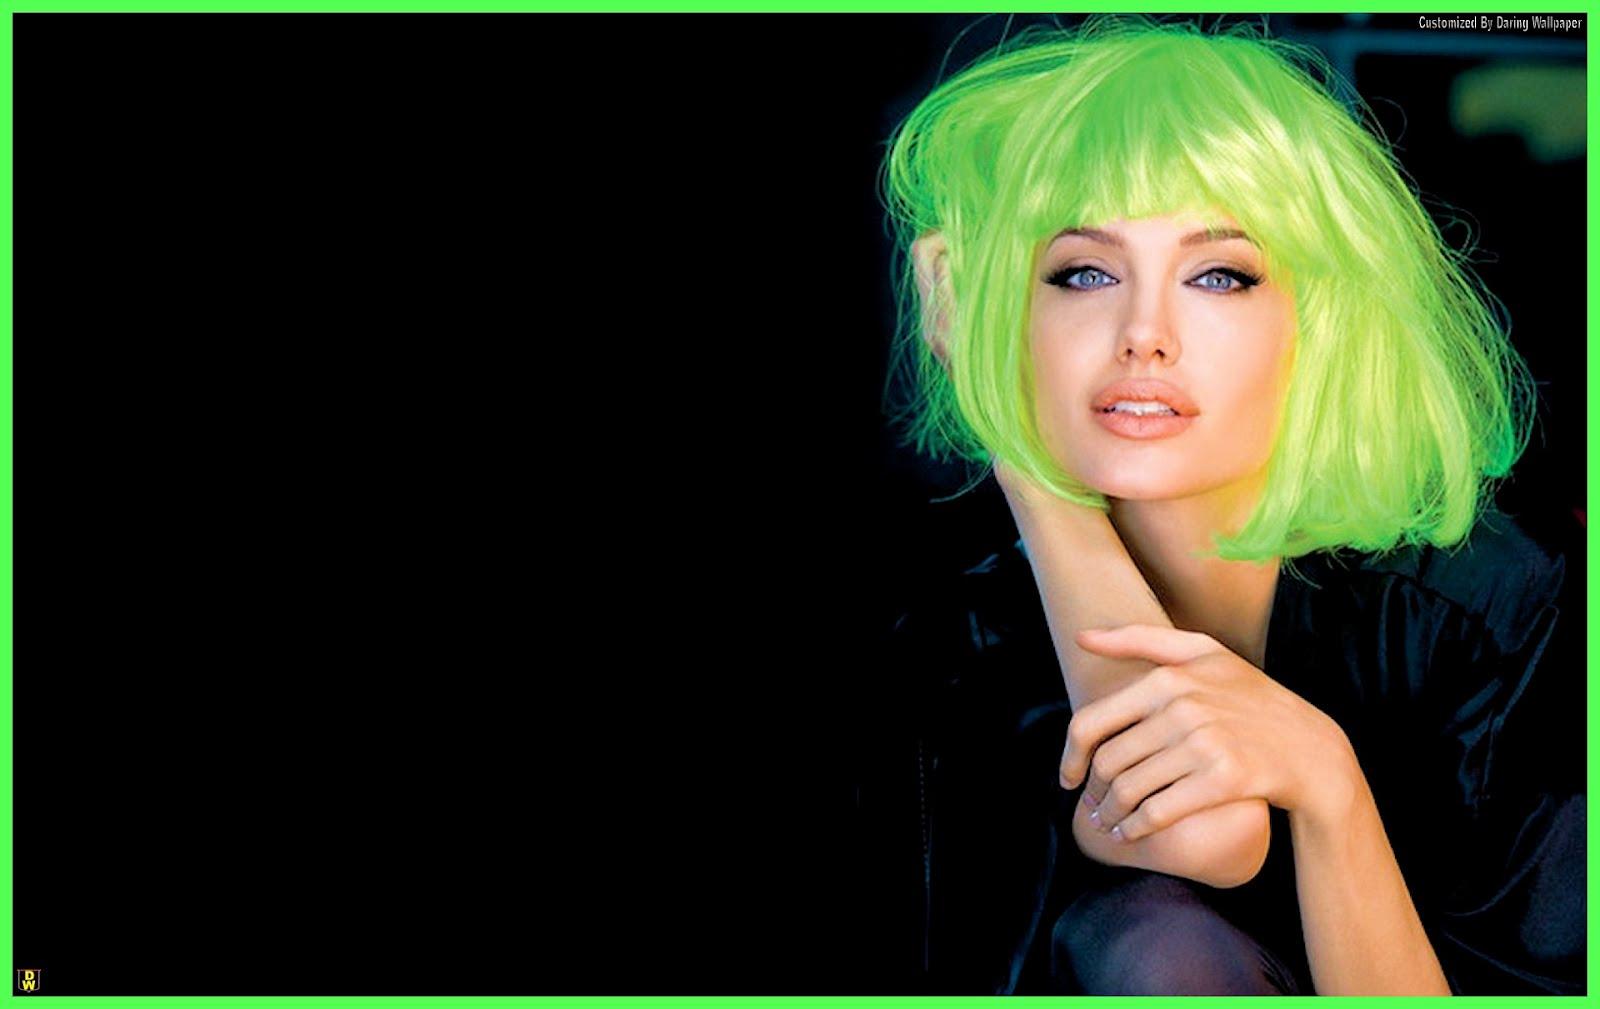 girl style green hair wild beautiful screensaver HQ HD Wallpaper 1600x1009